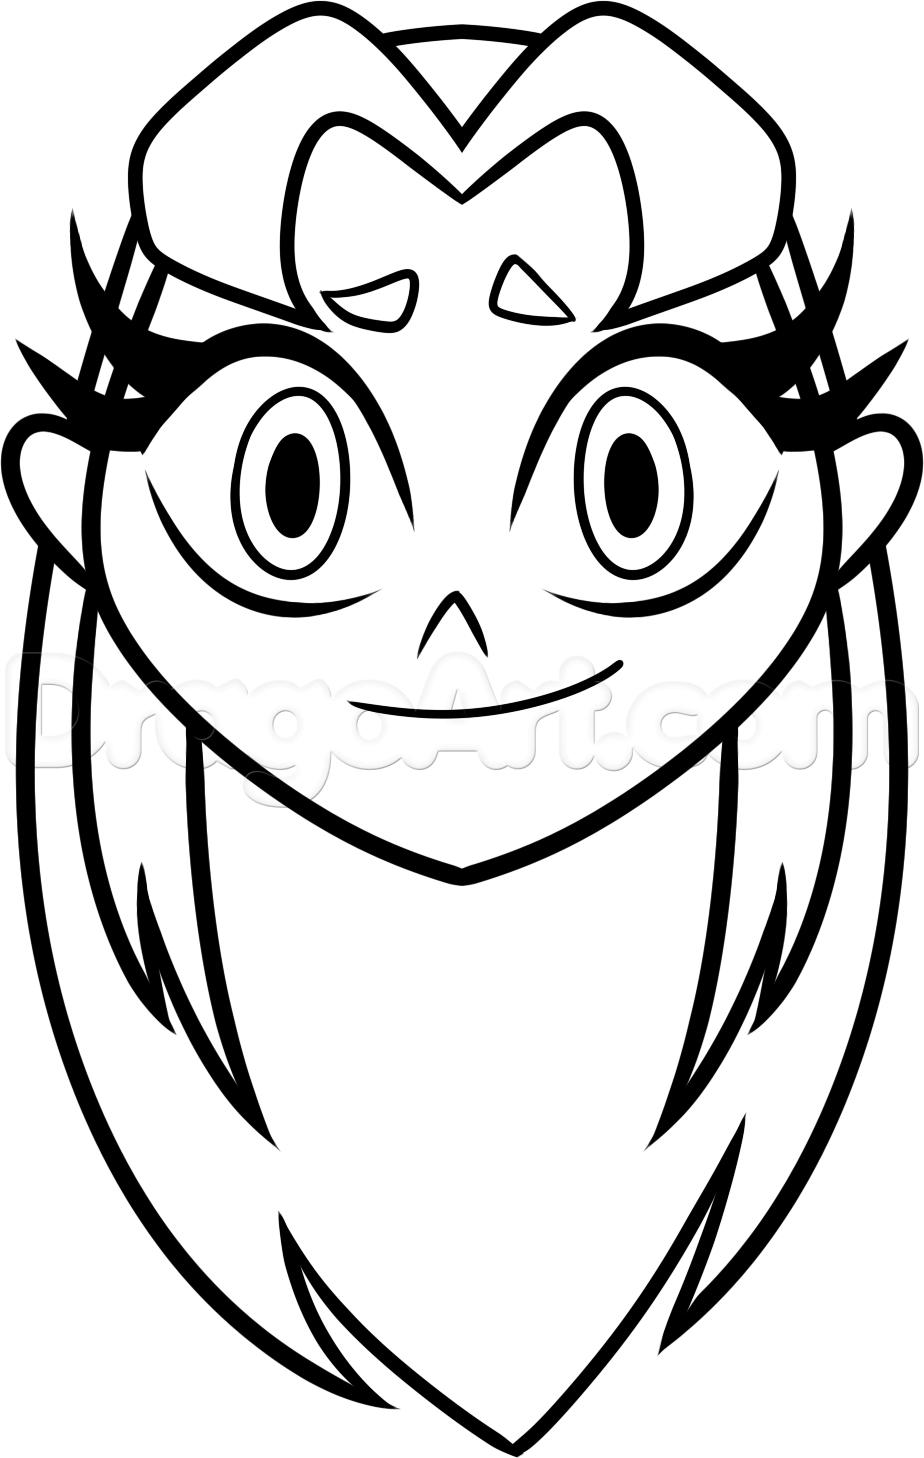 924x1458 Easy Sketch Drawing Of Cartoon Network